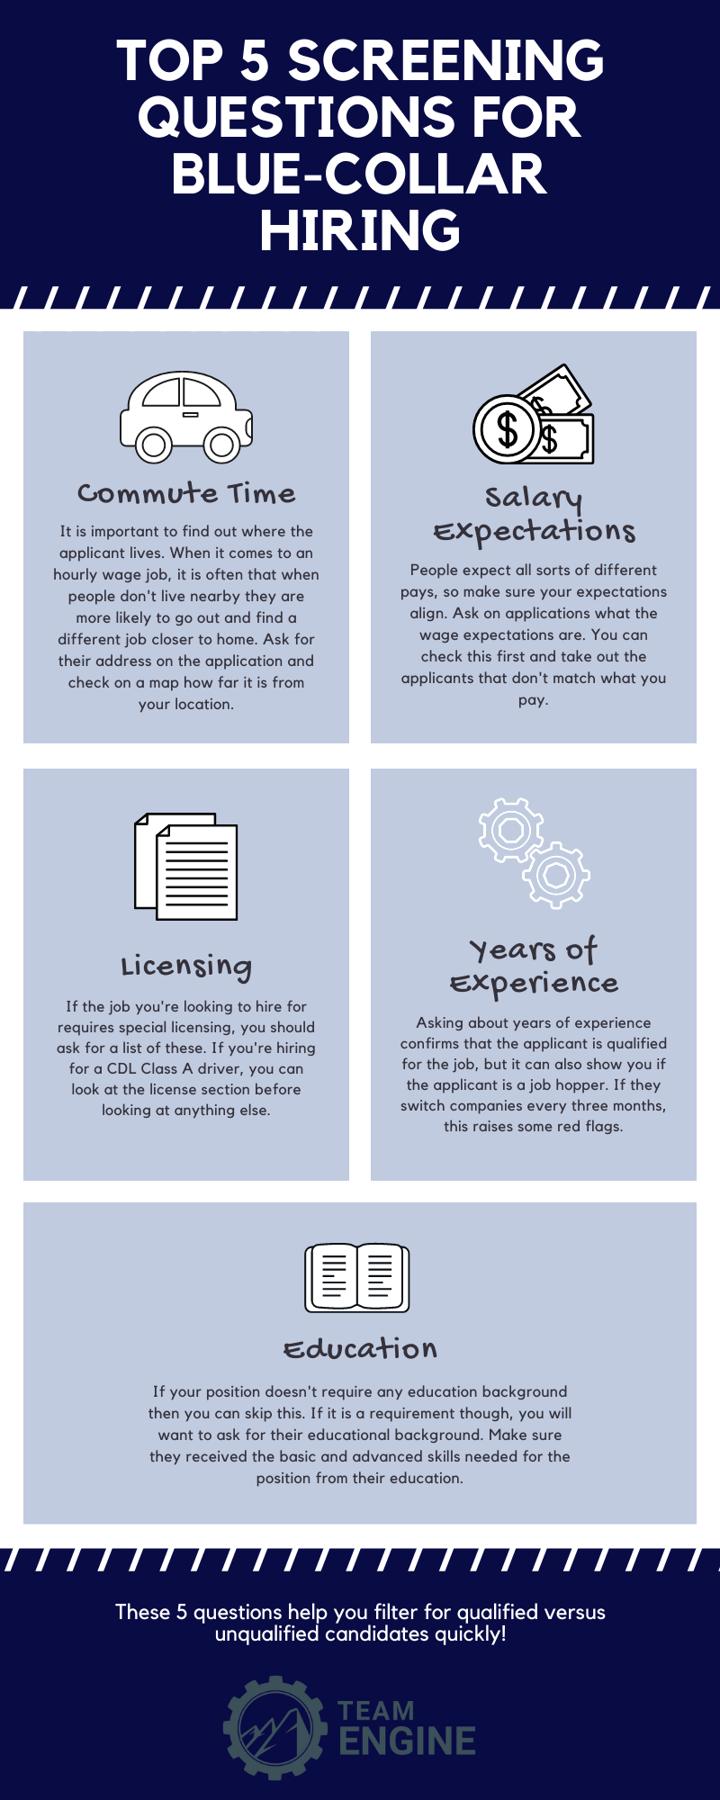 Blue-Collar application screening questions